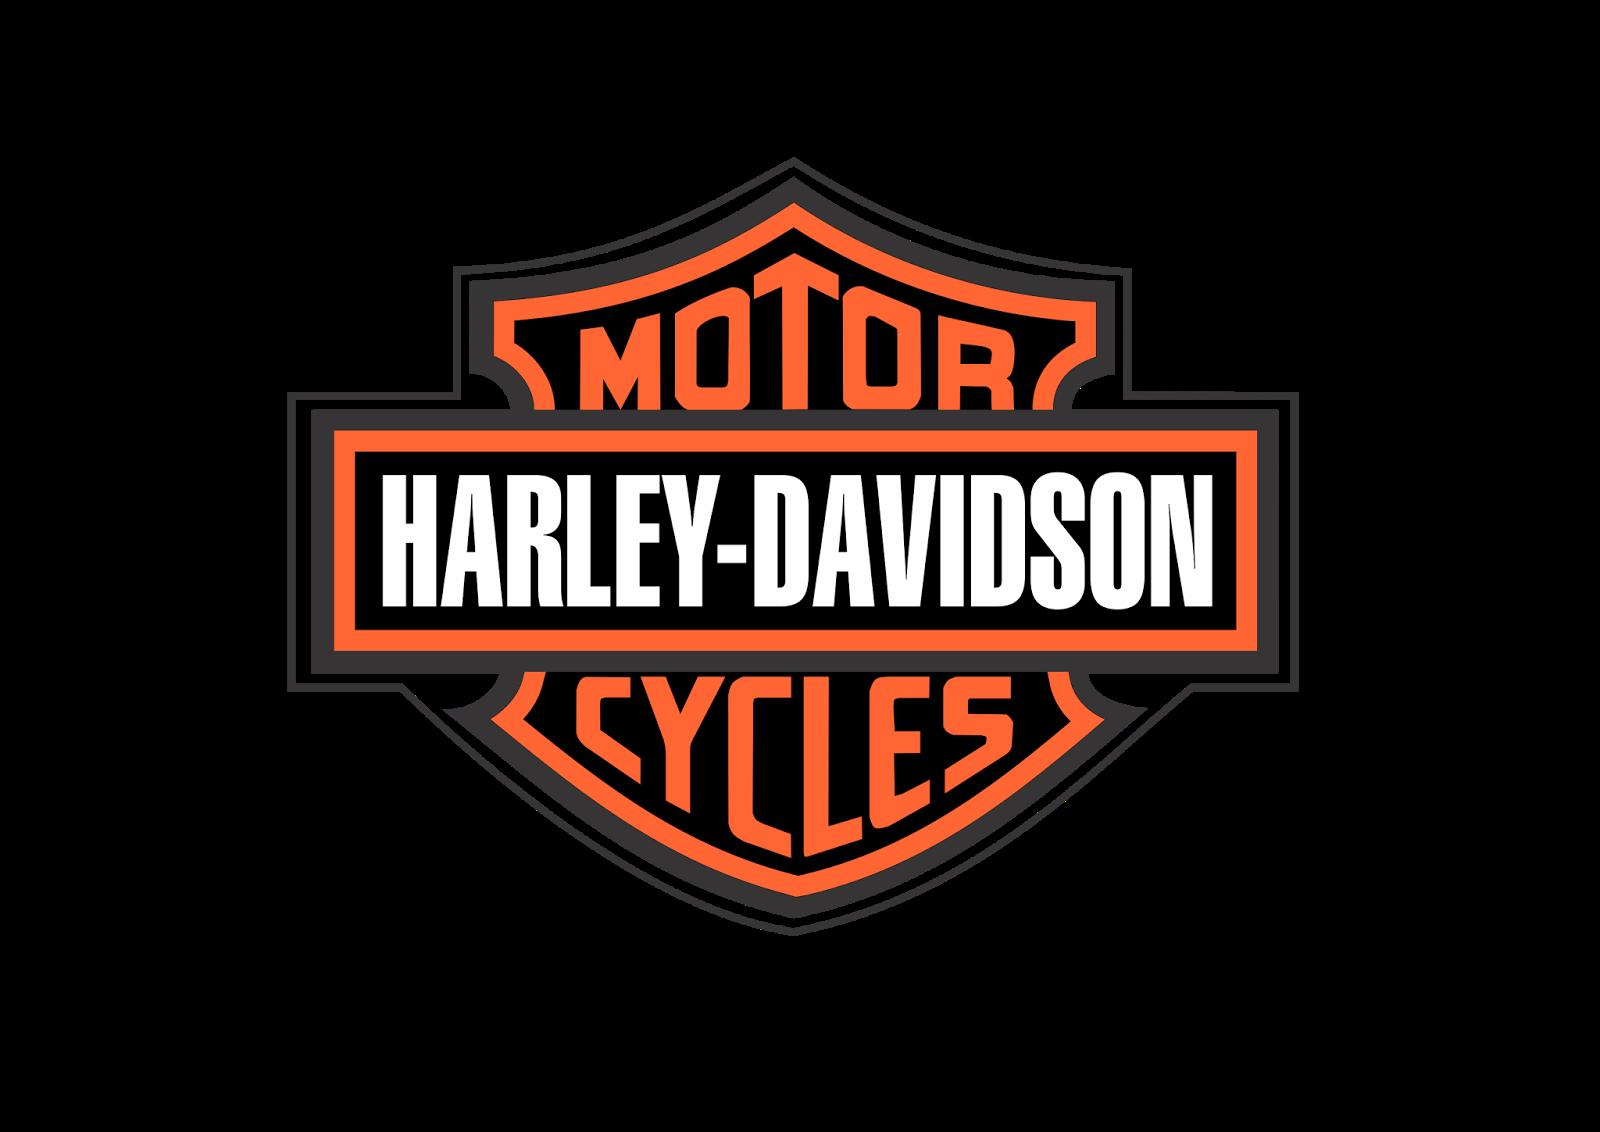 harley-davidson-logo-png-16307.png